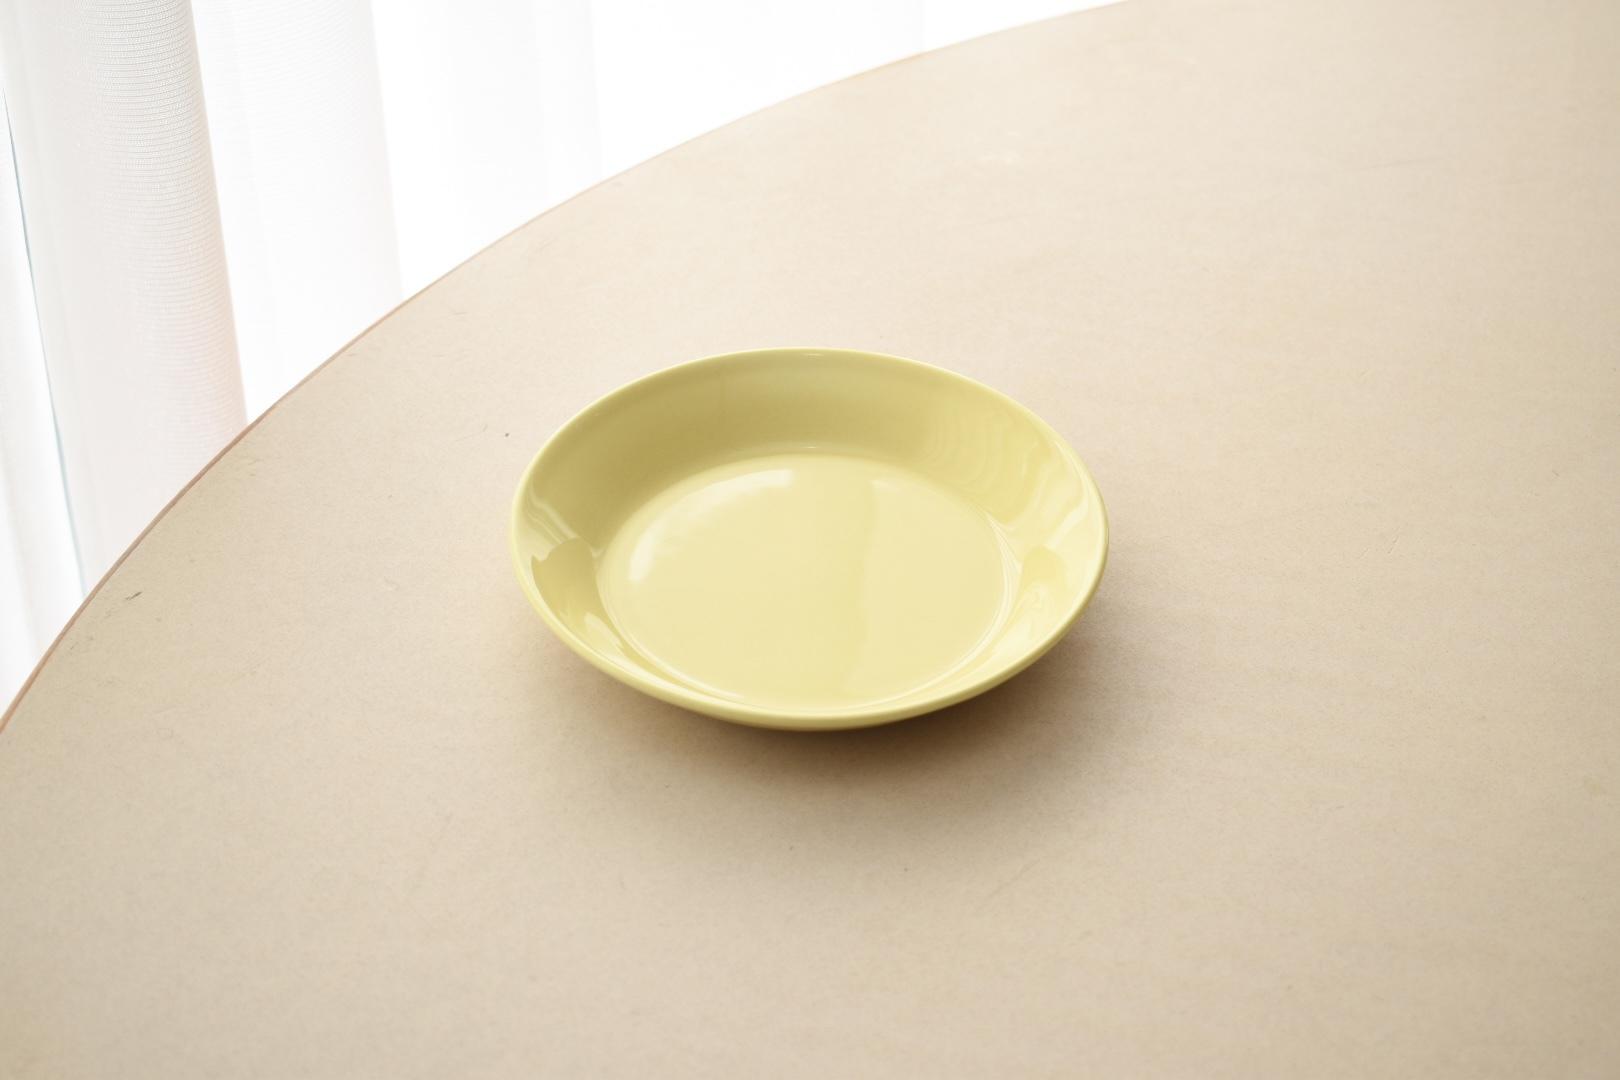 arabia teema cake plate yellow(Kaj Franck)